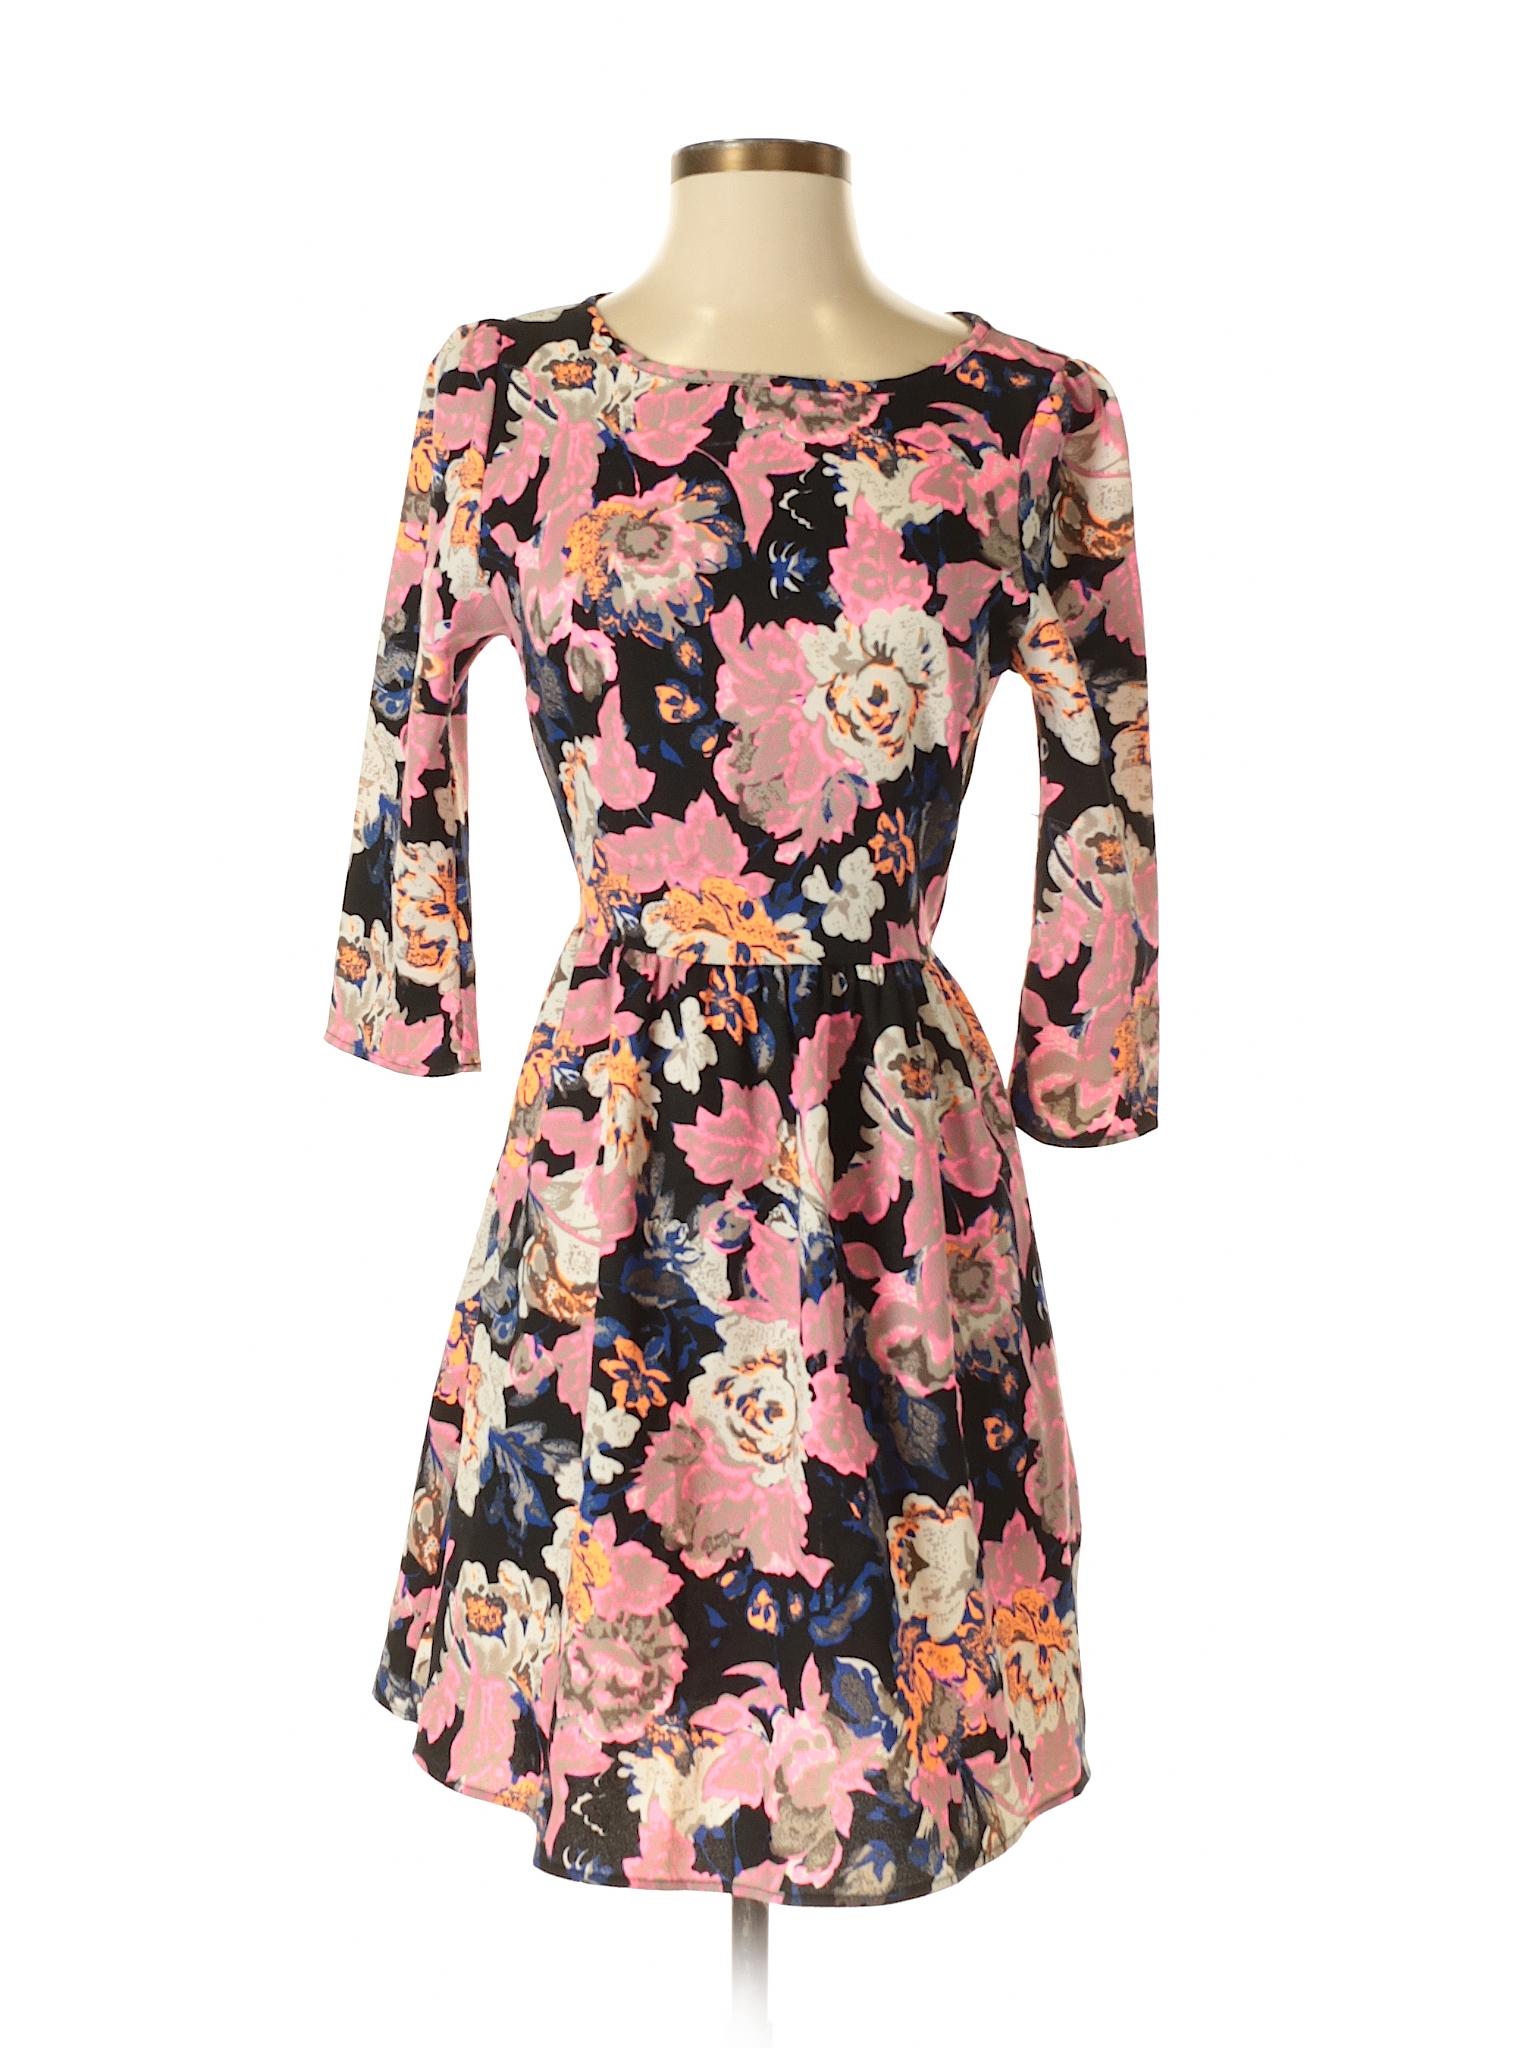 Selling Casual Casual Dress Selling Dress Selling Everly Everly Everly rqCrTU